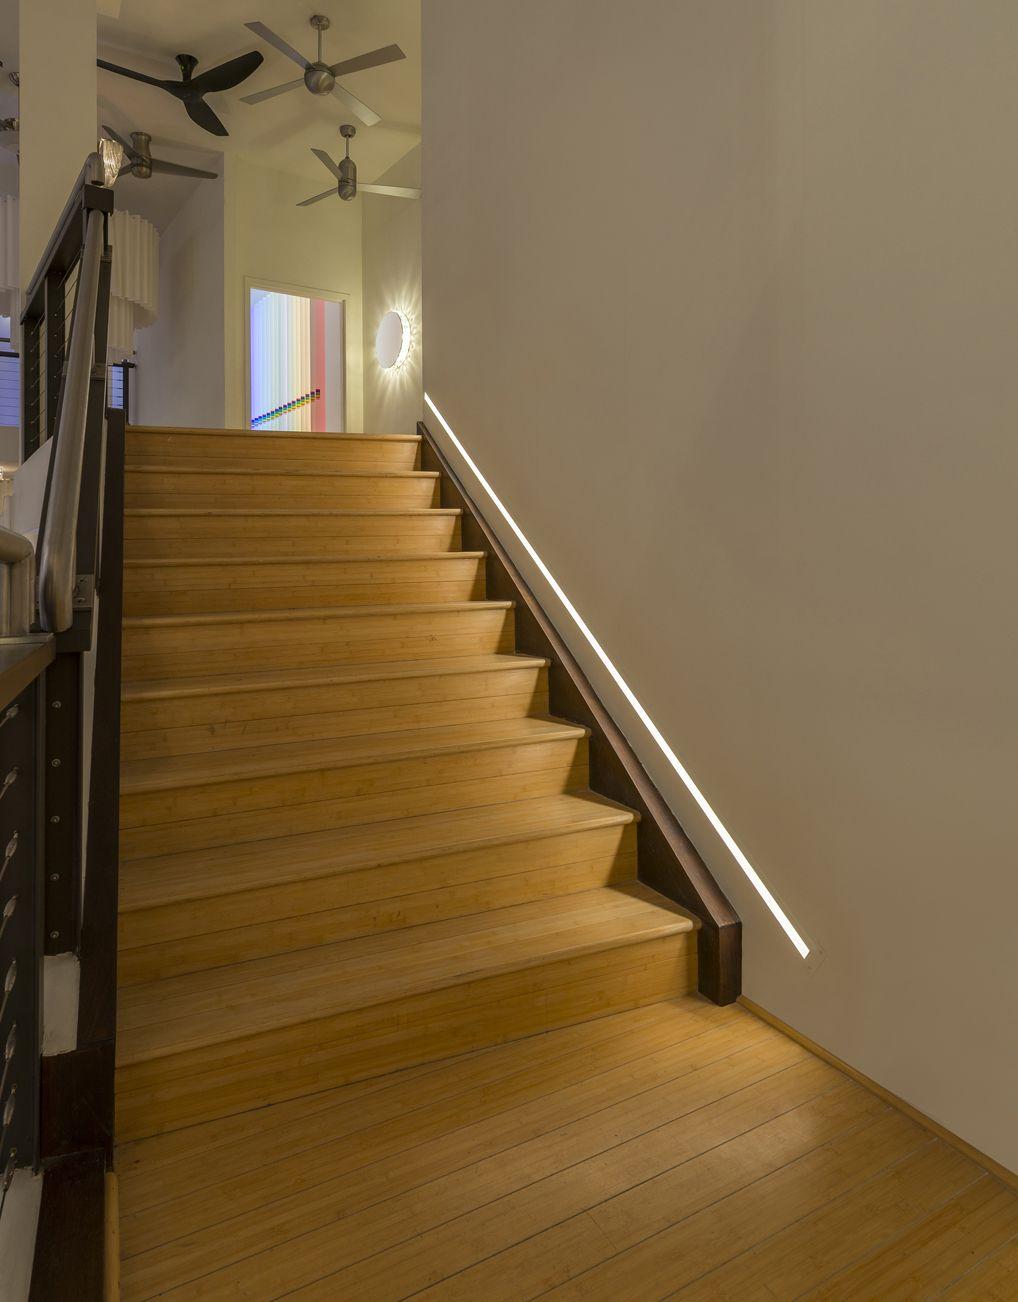 Lighting solution for dark hallways and stairways | Reveal - by Pure Lighting & Lighting solution for dark hallways and stairways | Reveal - by ... azcodes.com